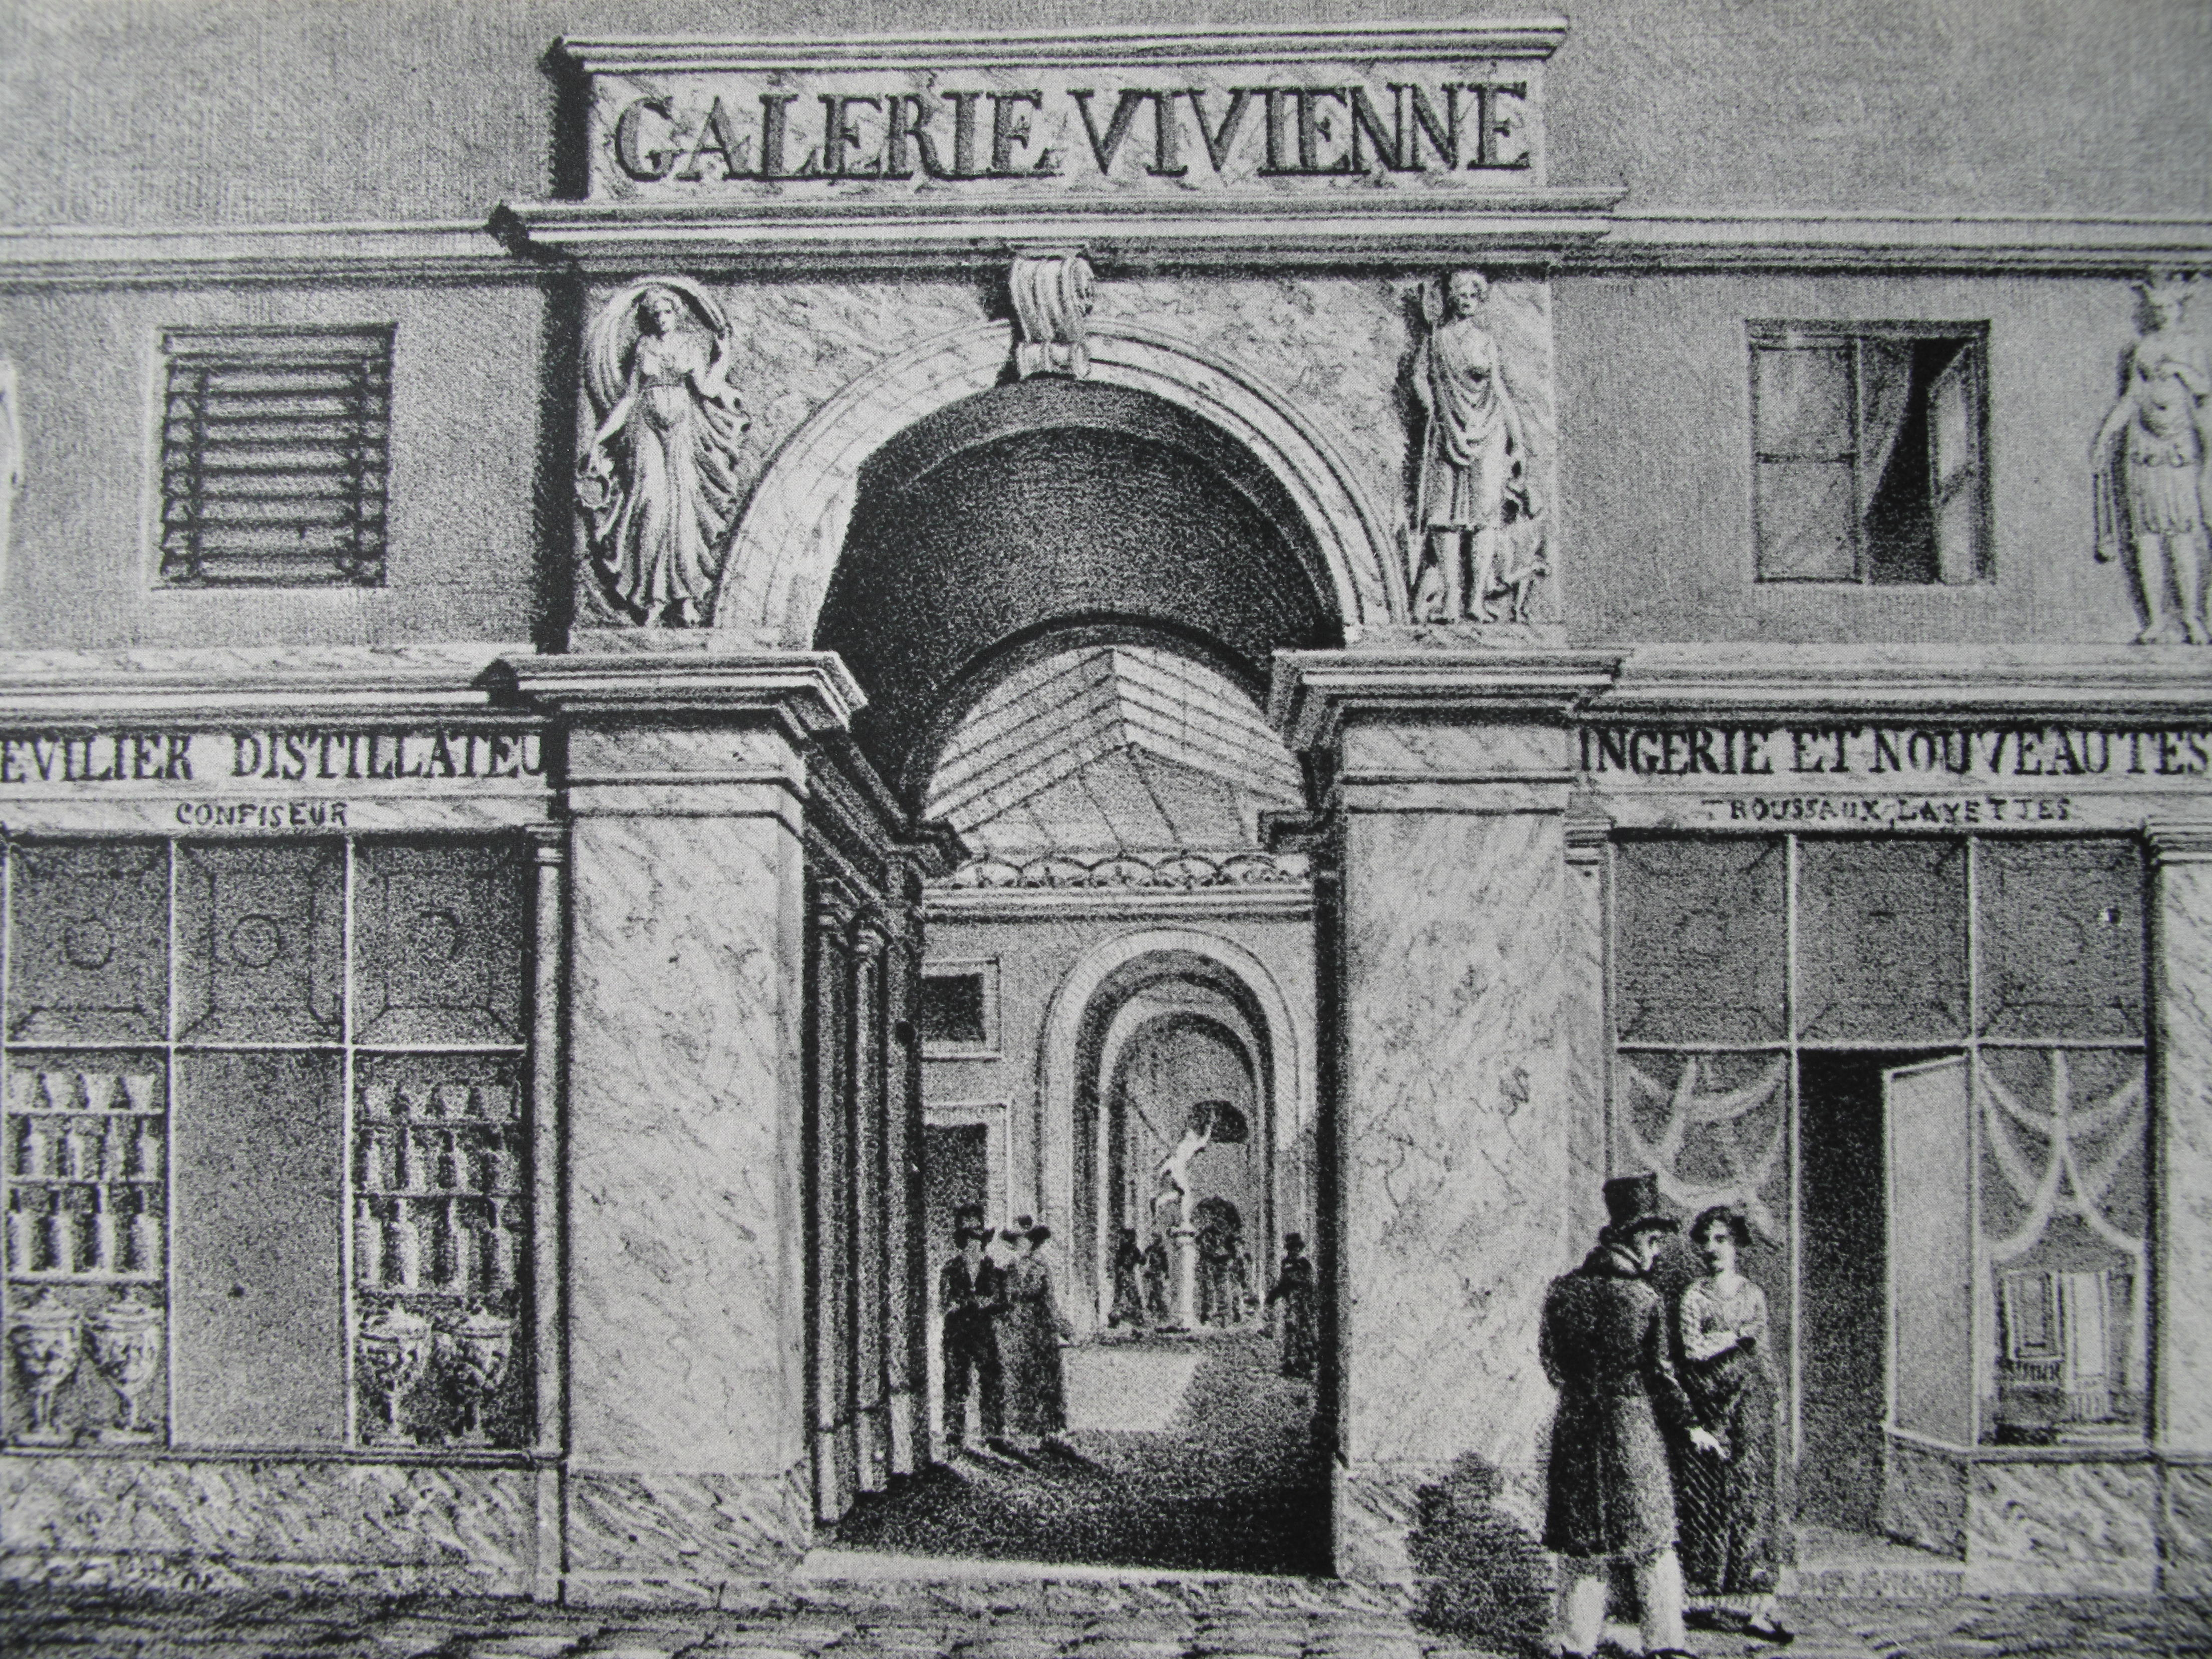 Galerie Vivienne 1820